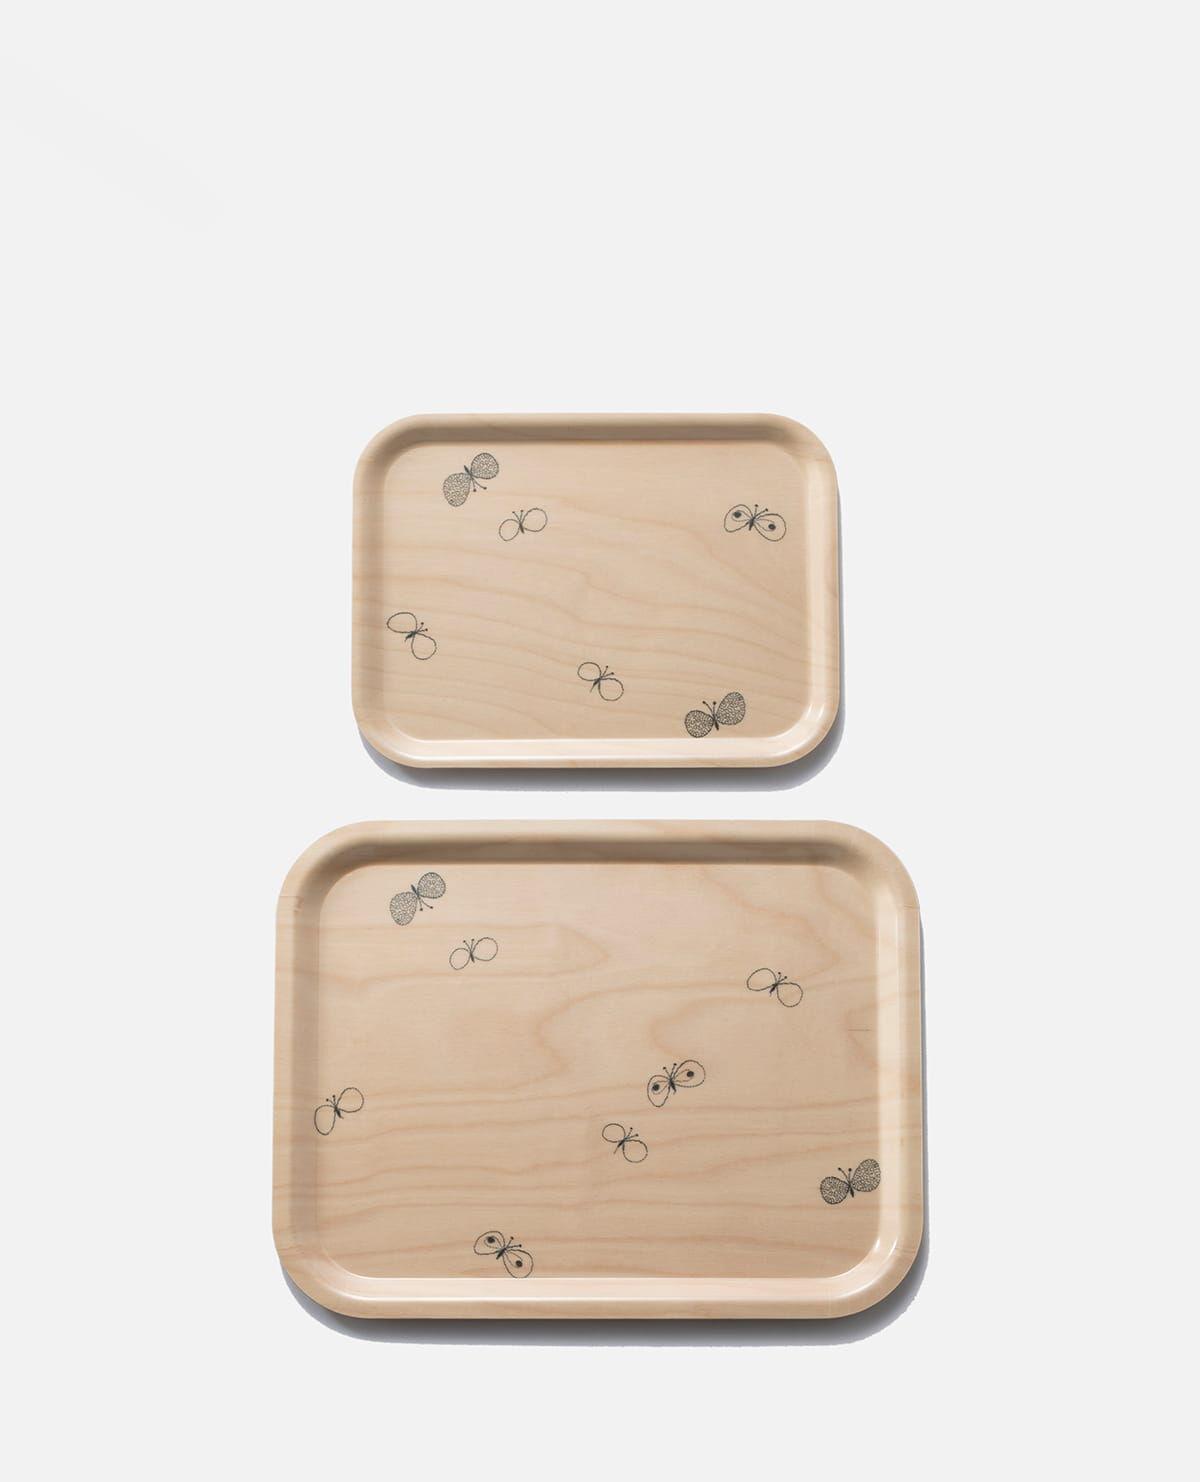 choucho トレイS(ギフトBOX付)